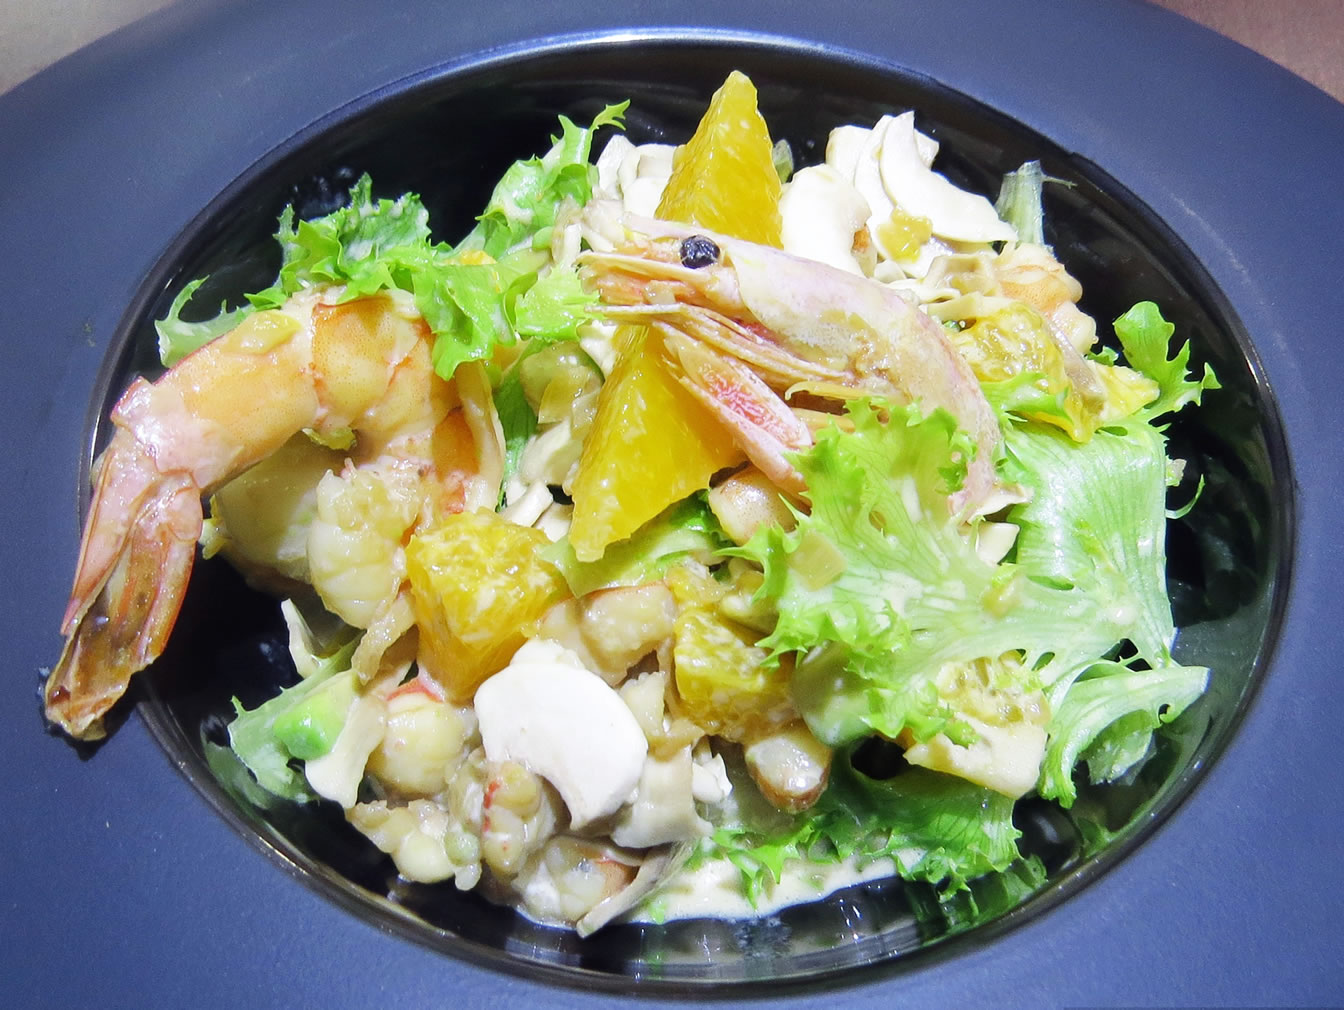 Салат от Давида Десо ресторан Аннам Брахма в Оренбурге